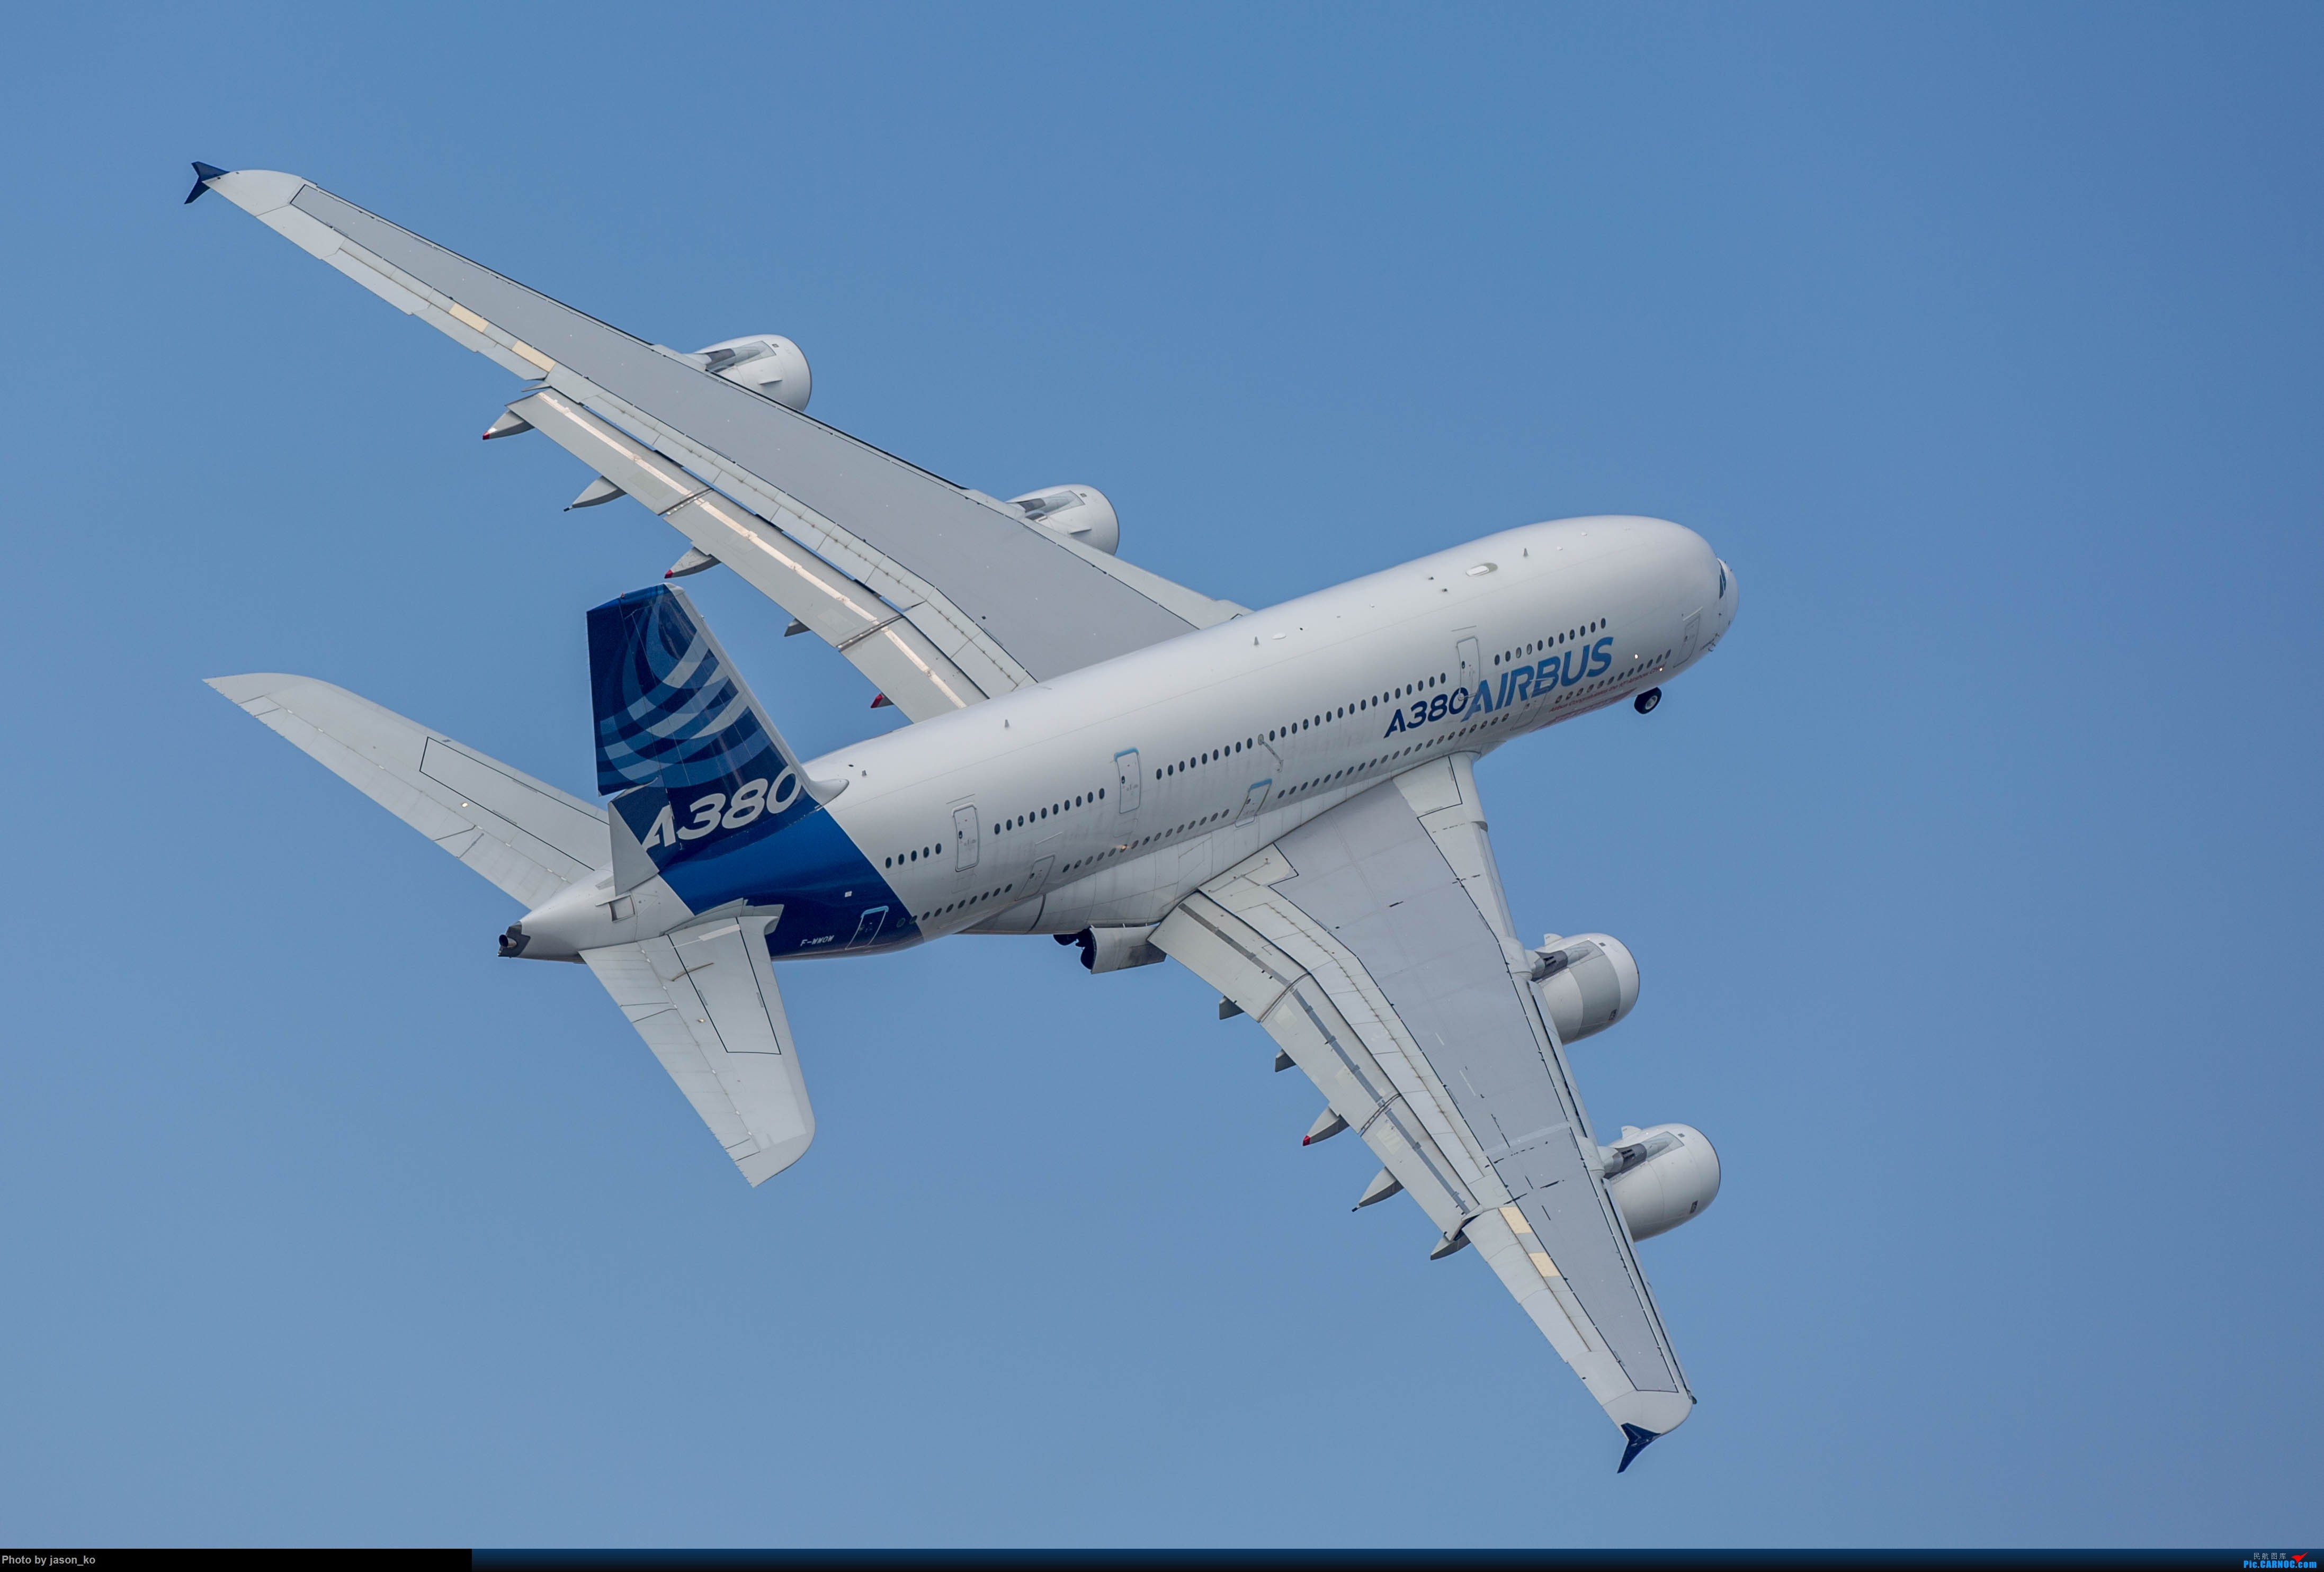 a380飞机图片_[ 审核图片]   [ 图片exif] 图片类别: 飞机 机型: airbus a380 拍摄